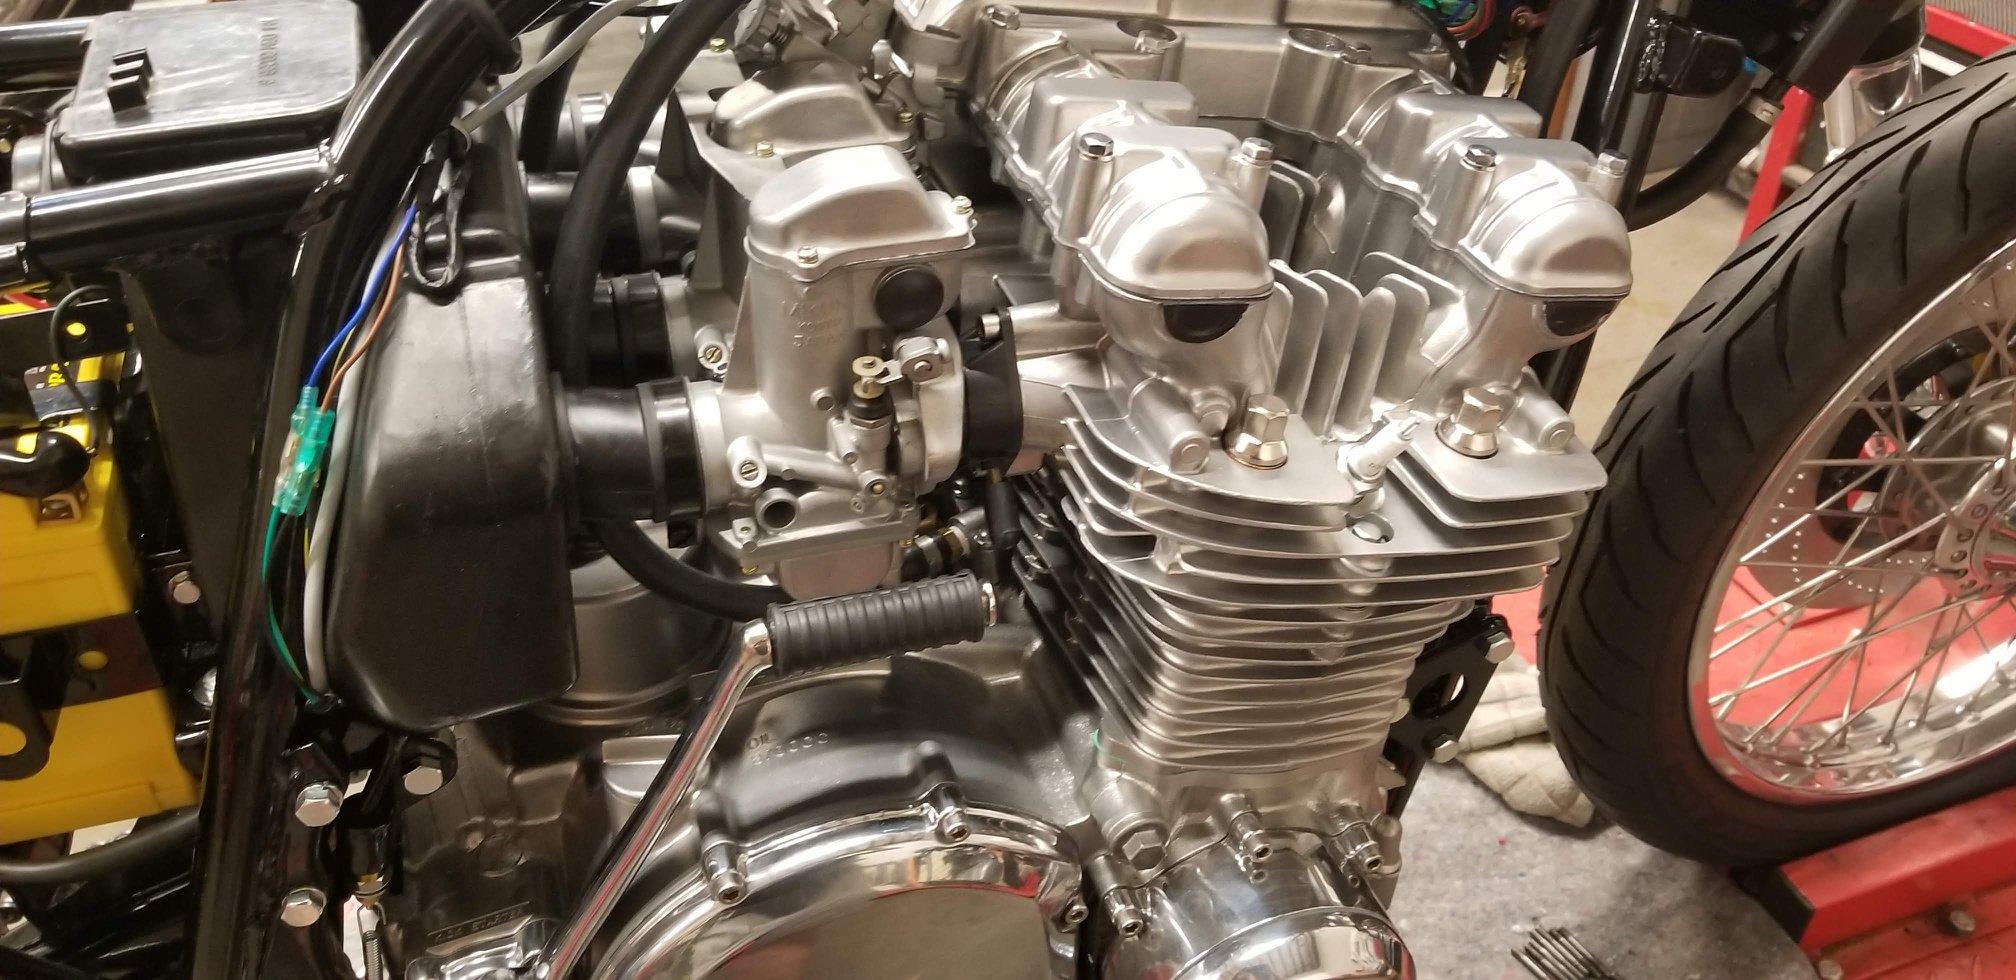 Engine done!